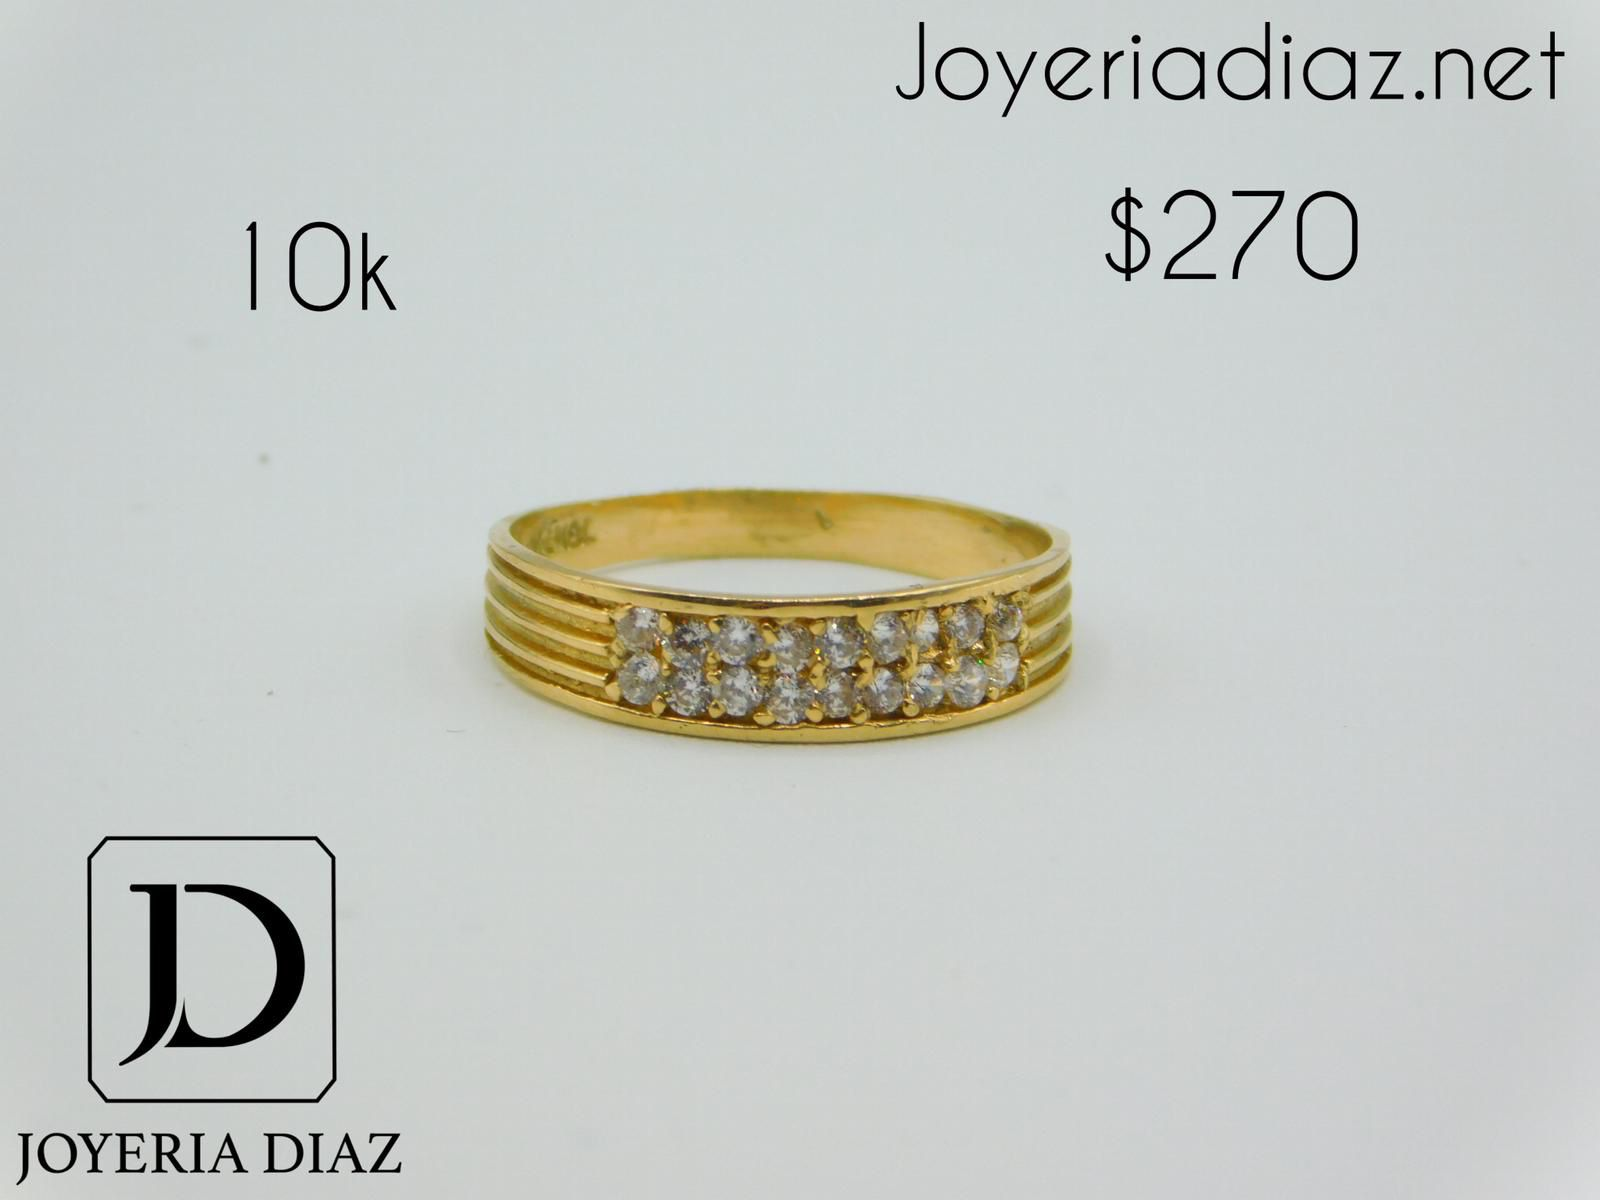 10k gold engagement ring